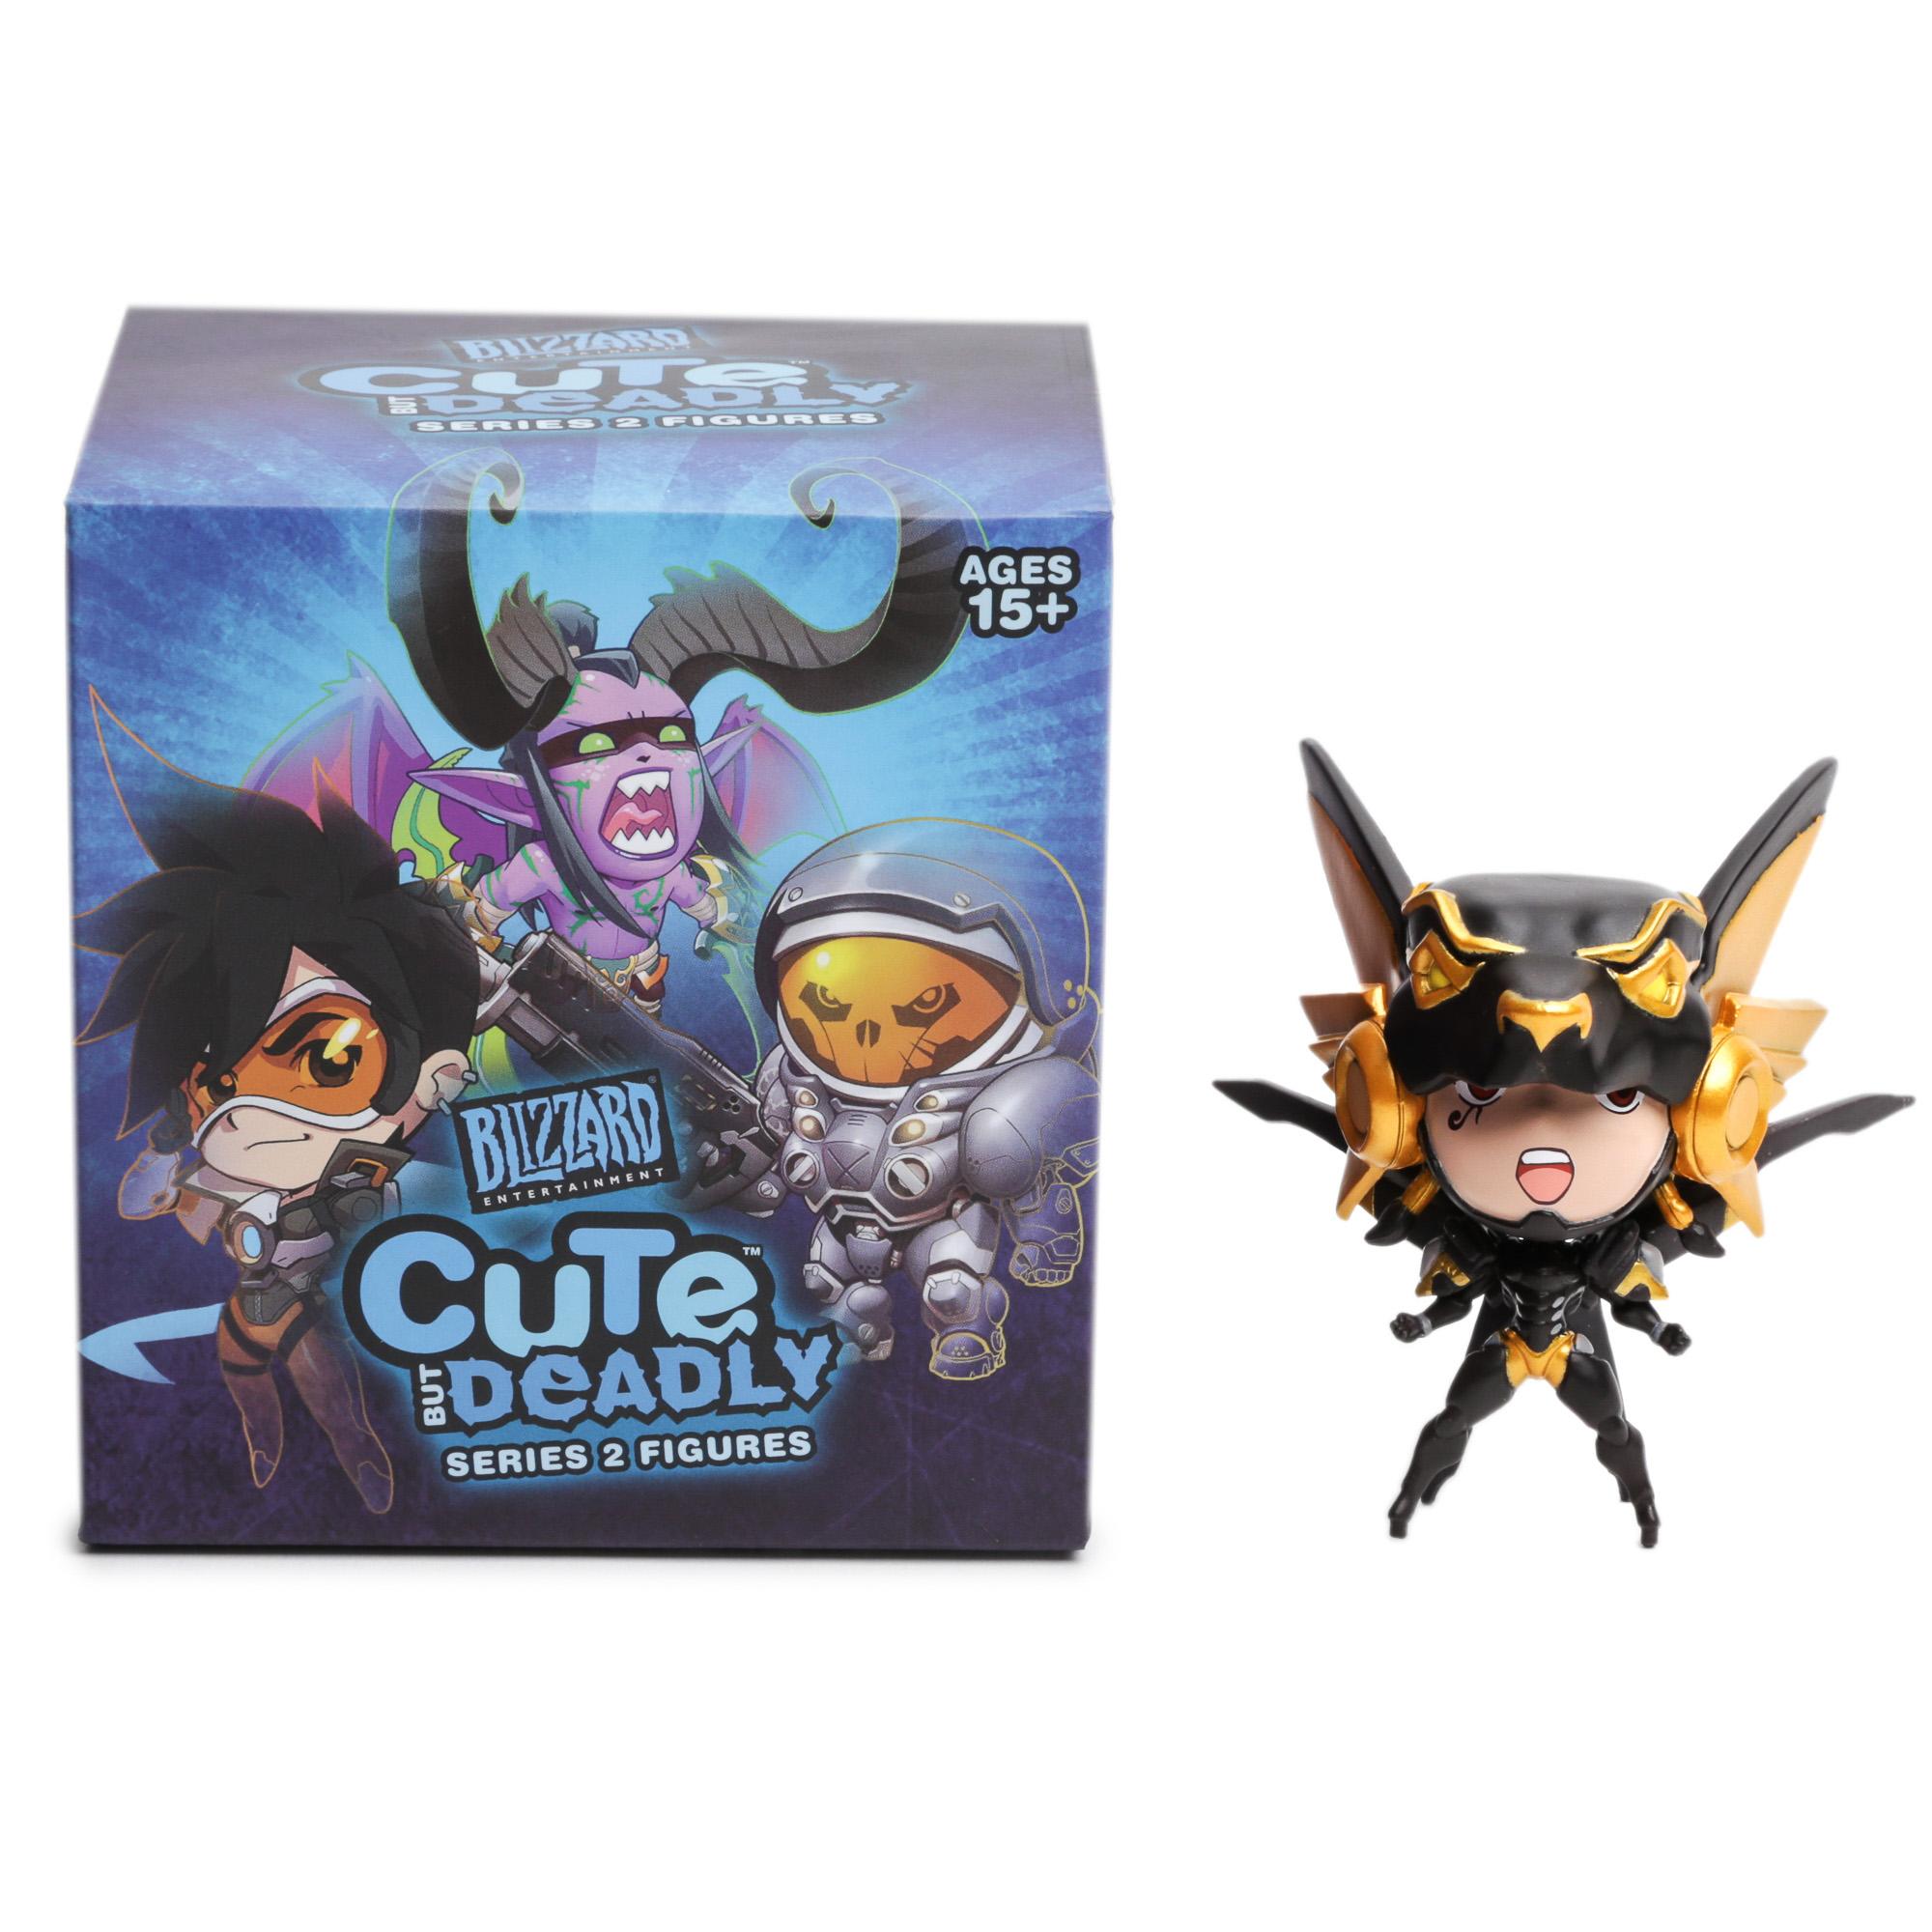 Blind Box Deals on Hollar - Blizzard Cute But Deadly Series 2 $5, KidRobot Street Fighter, Steven Universe + More